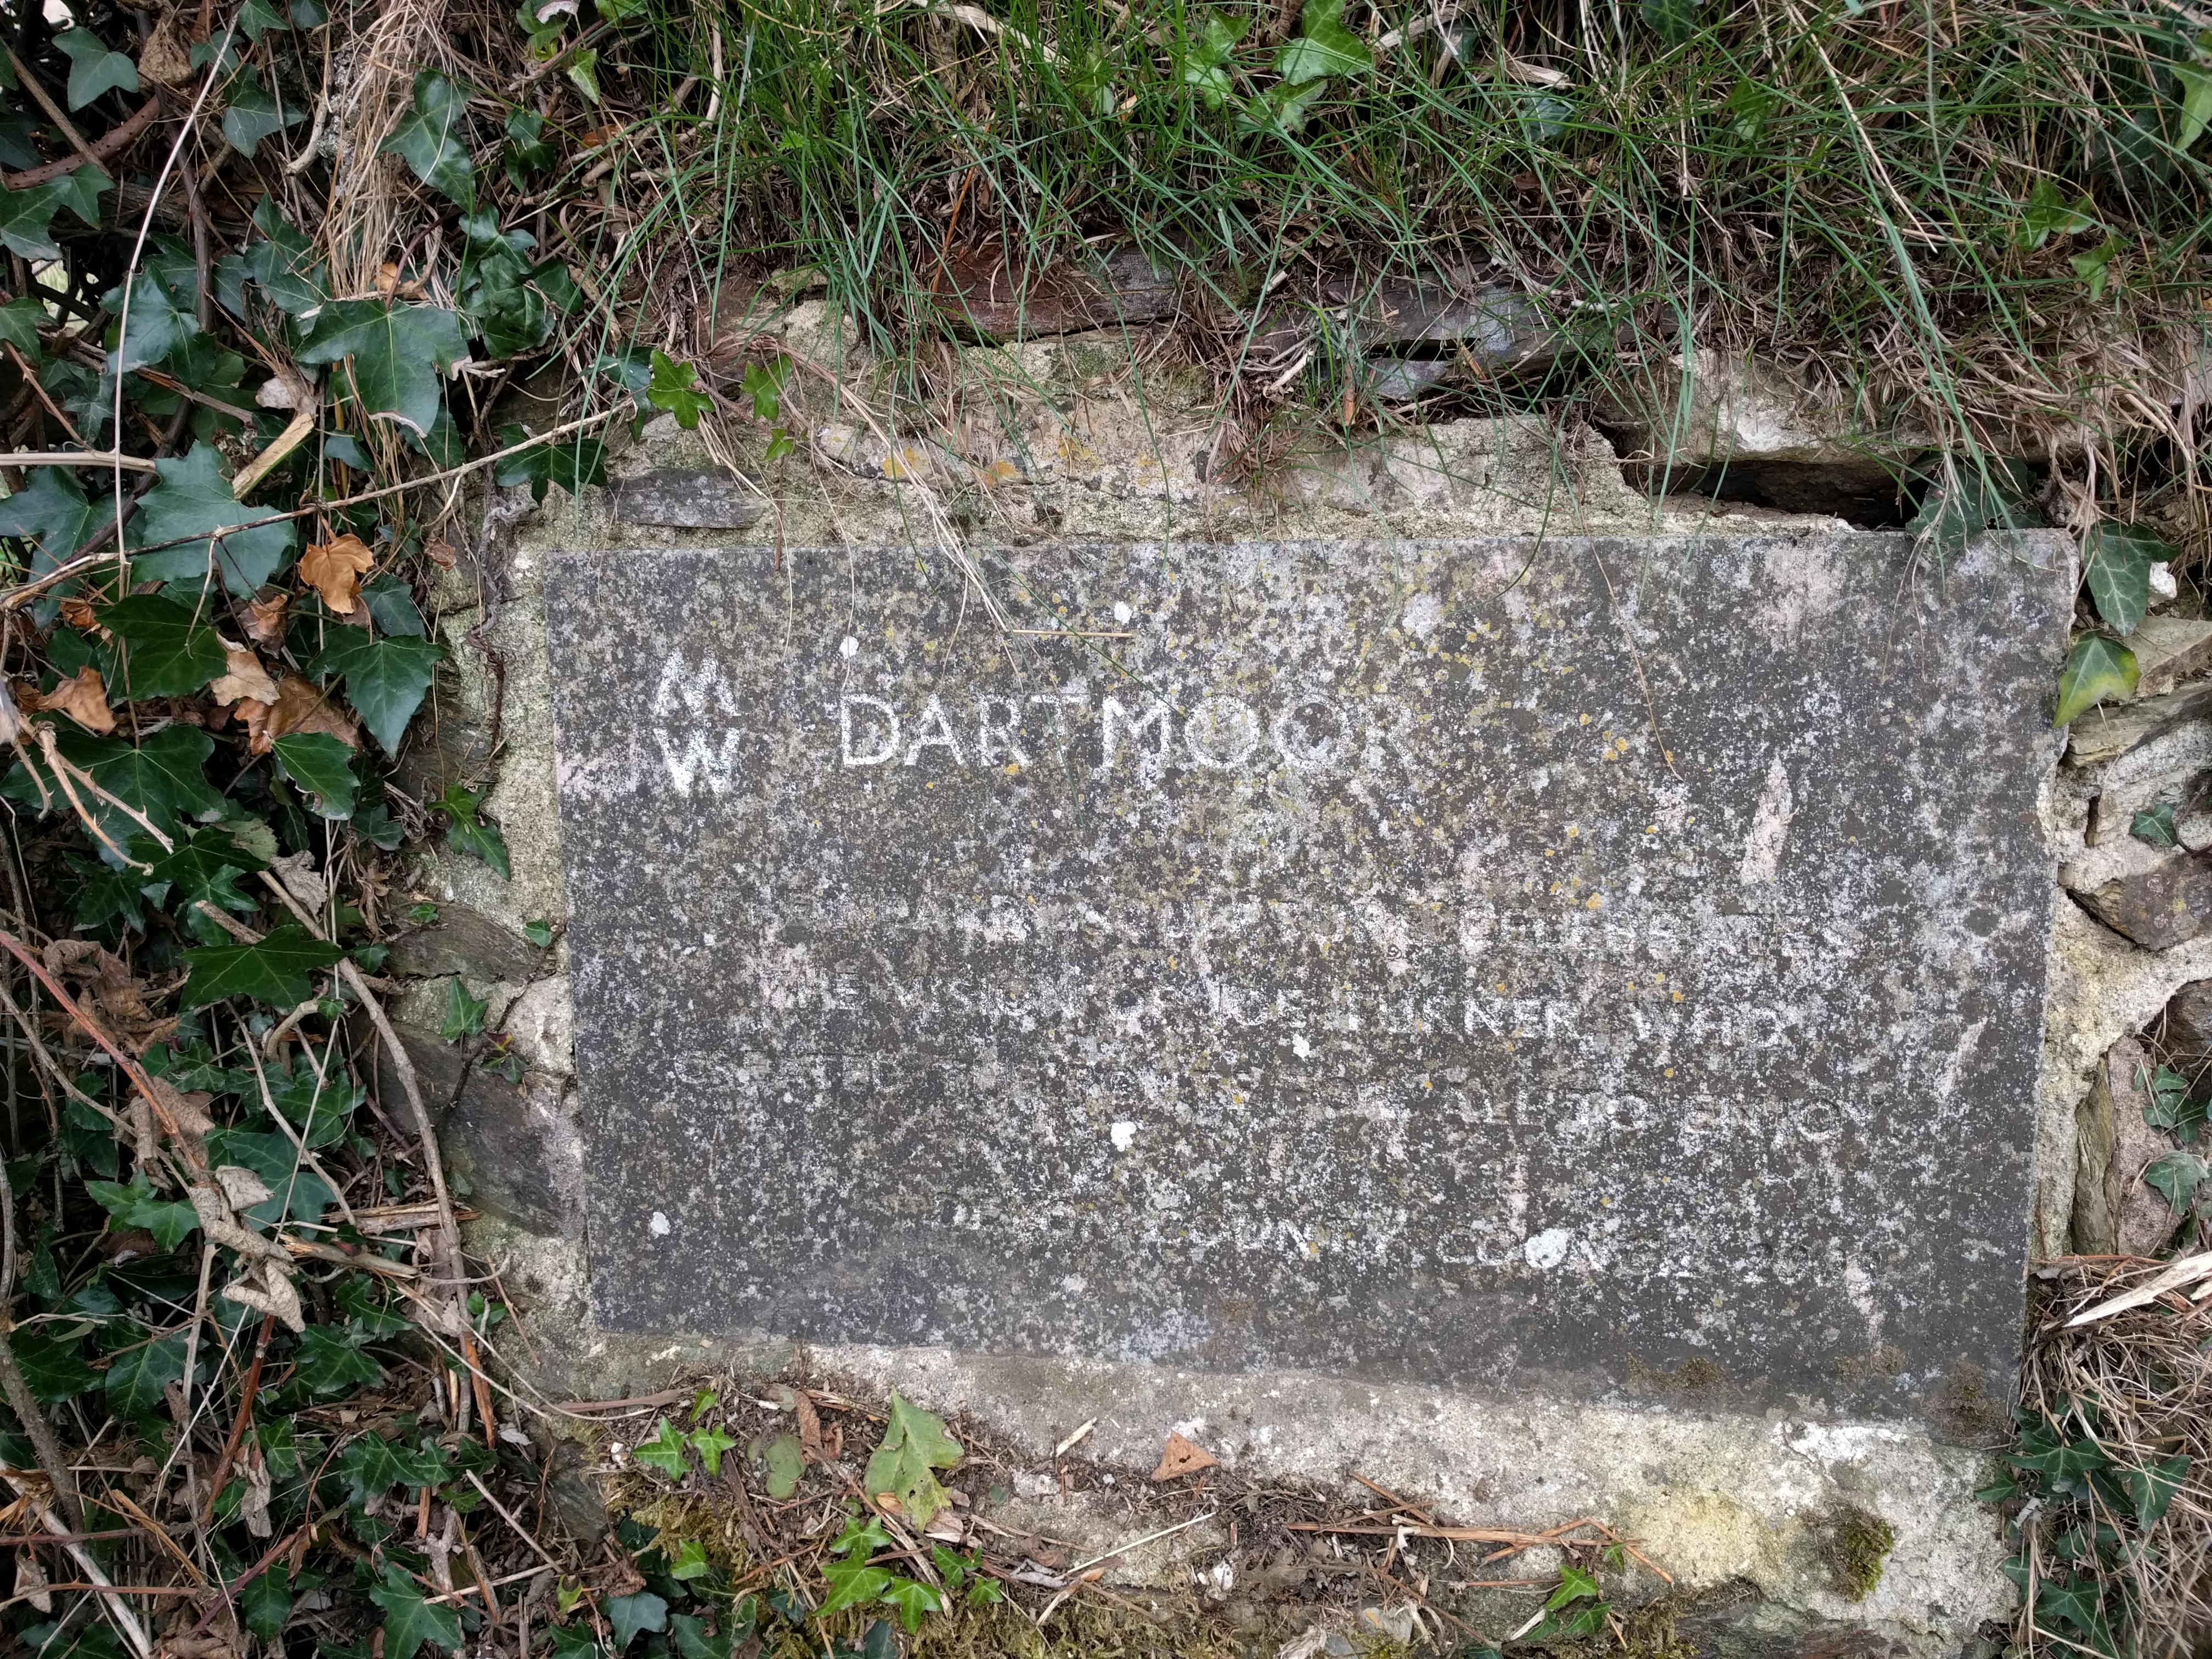 Dartmoor! #sh #twomoorsway